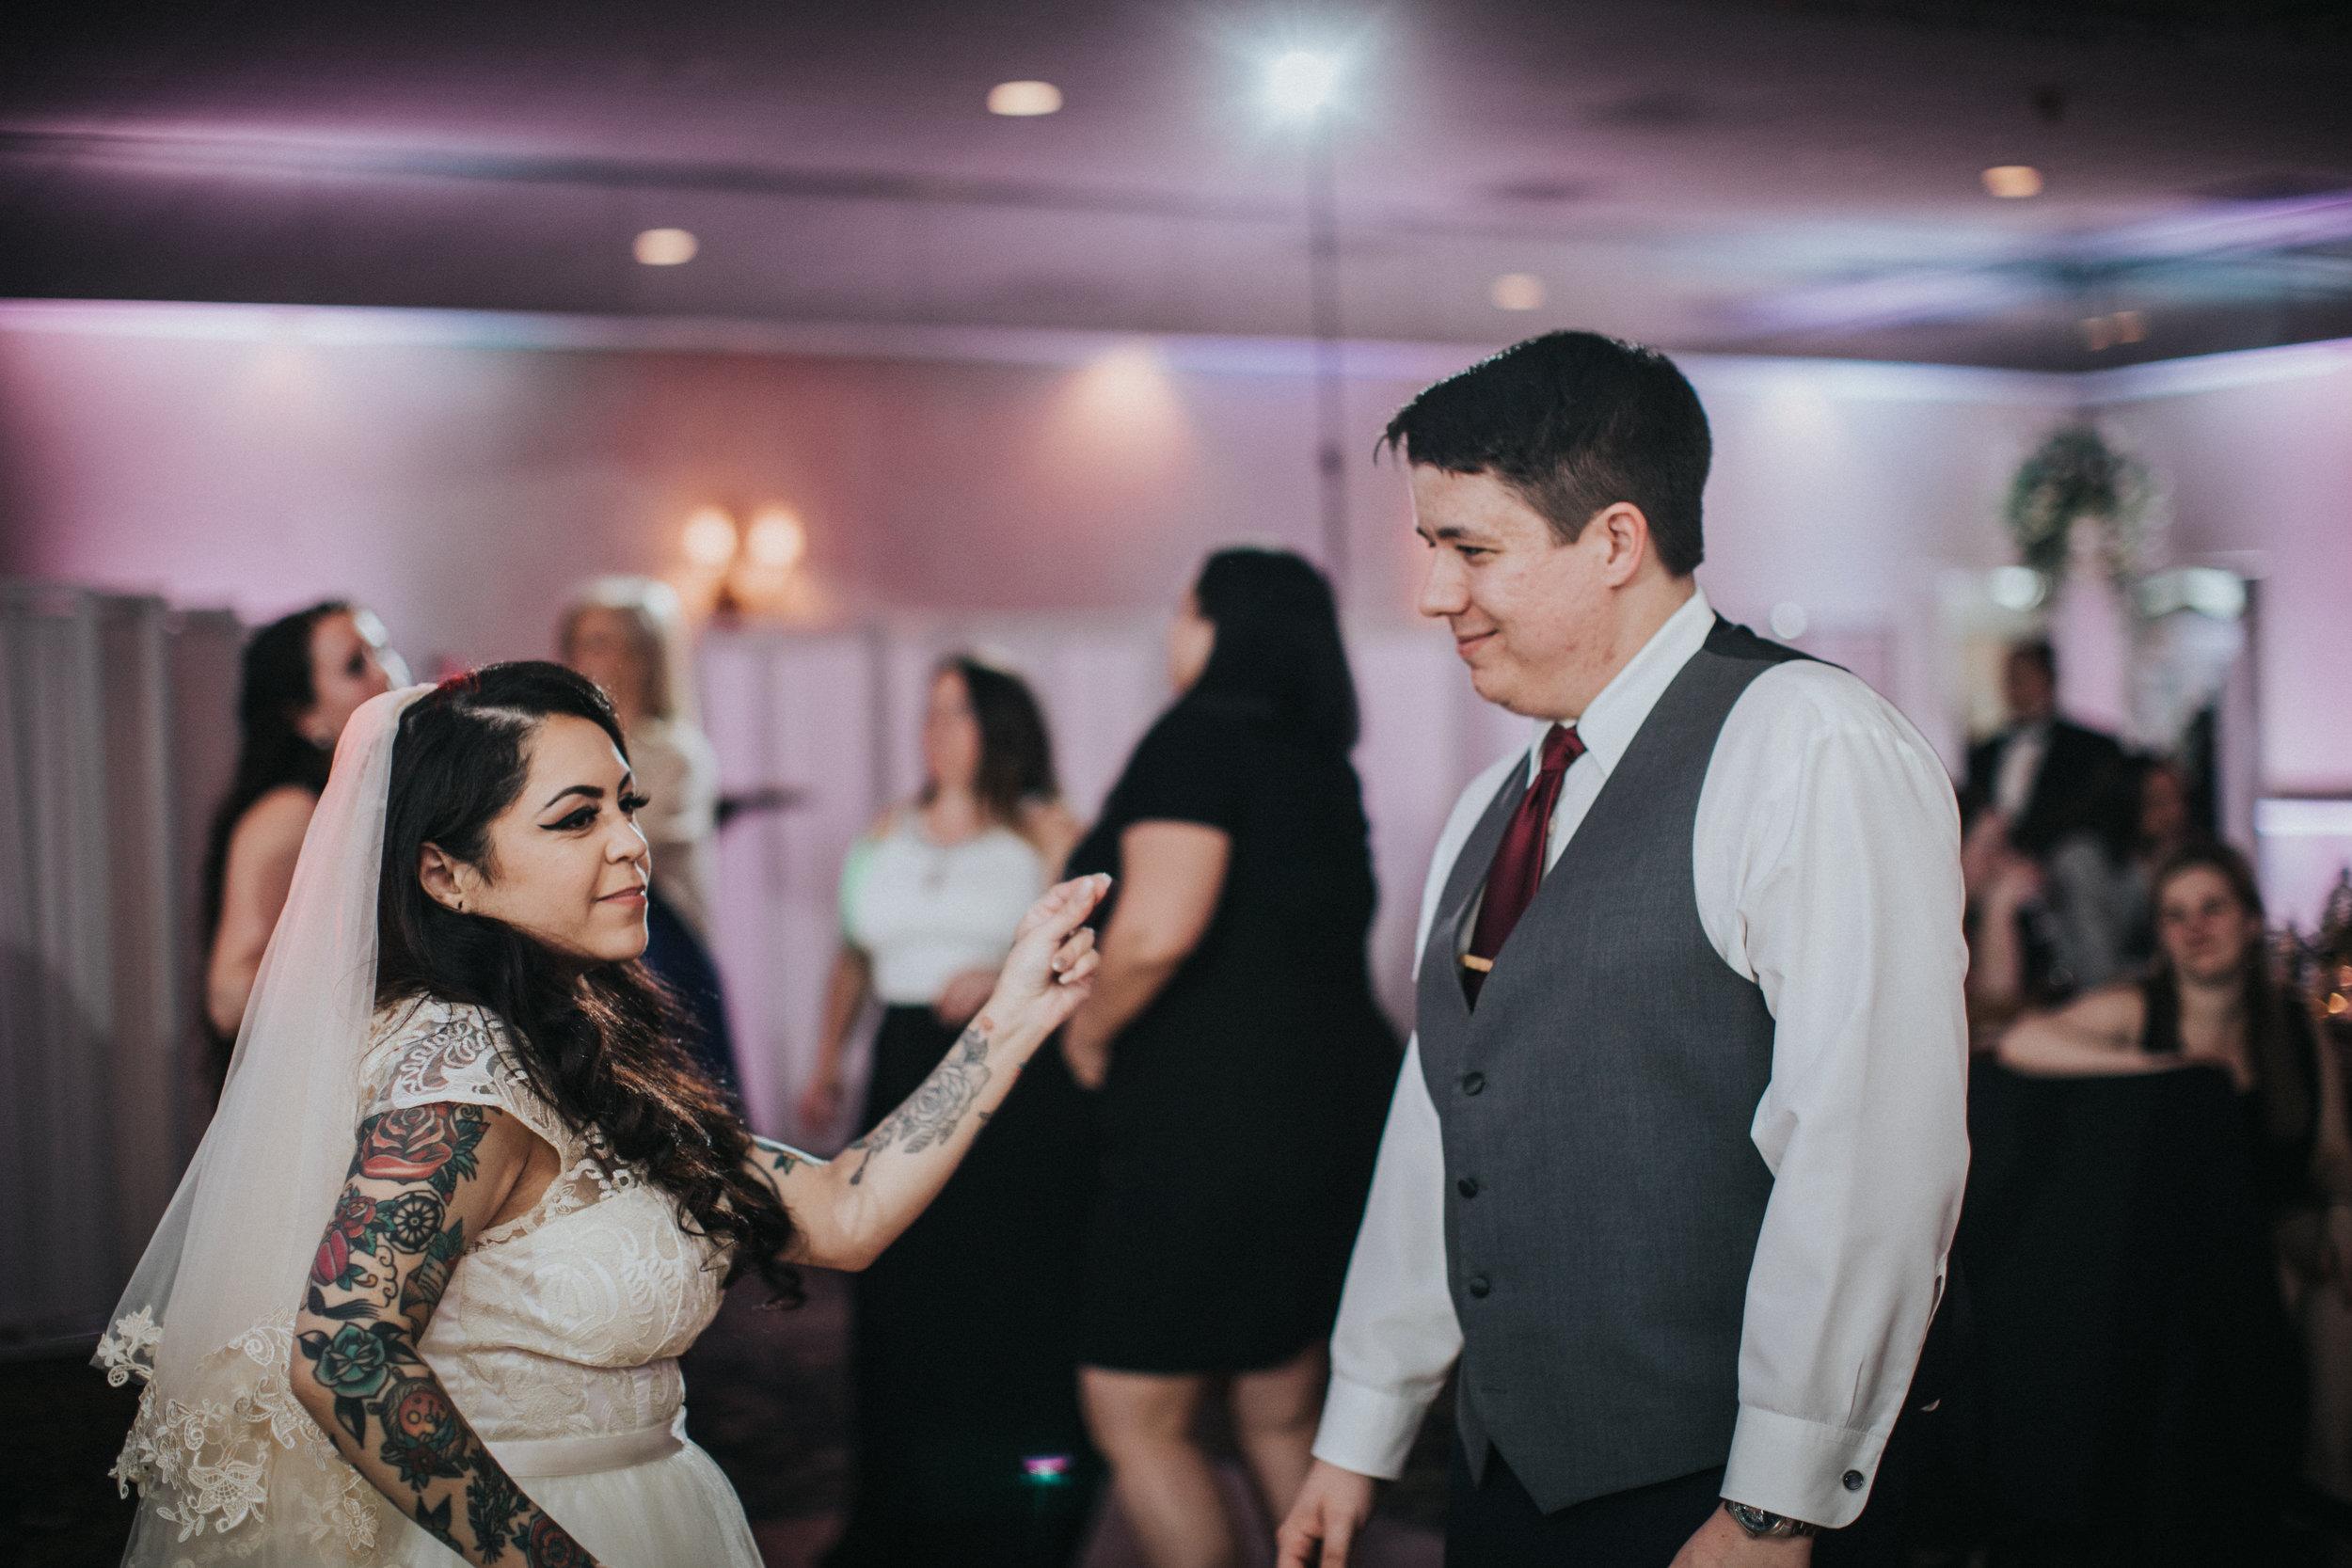 New-Jersey-Wedding-Photographer-ReceptionCenter-Valeria&Mike-Reception (261 of 265).jpg